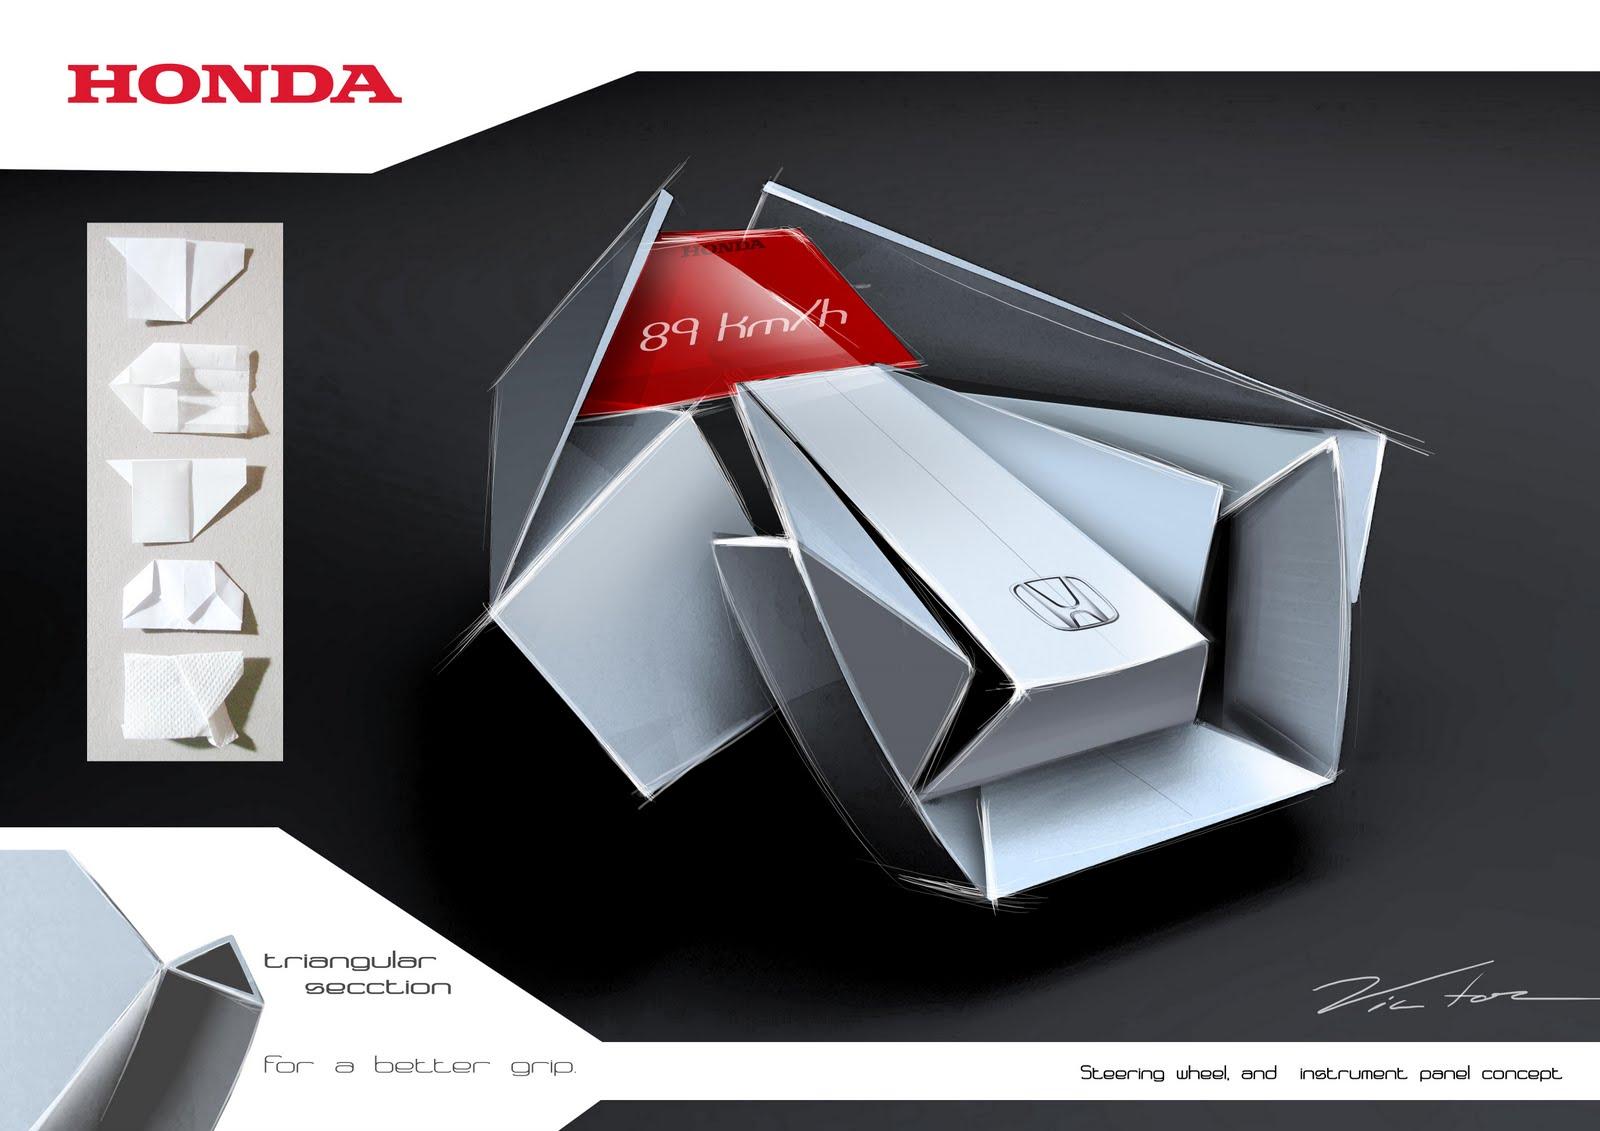 http://4.bp.blogspot.com/_dekR9Gz7p1A/S8pFy0UQ9gI/AAAAAAAAAV8/7fK_uvrV_ak/s1600/1+volante+honda+copia.jpg